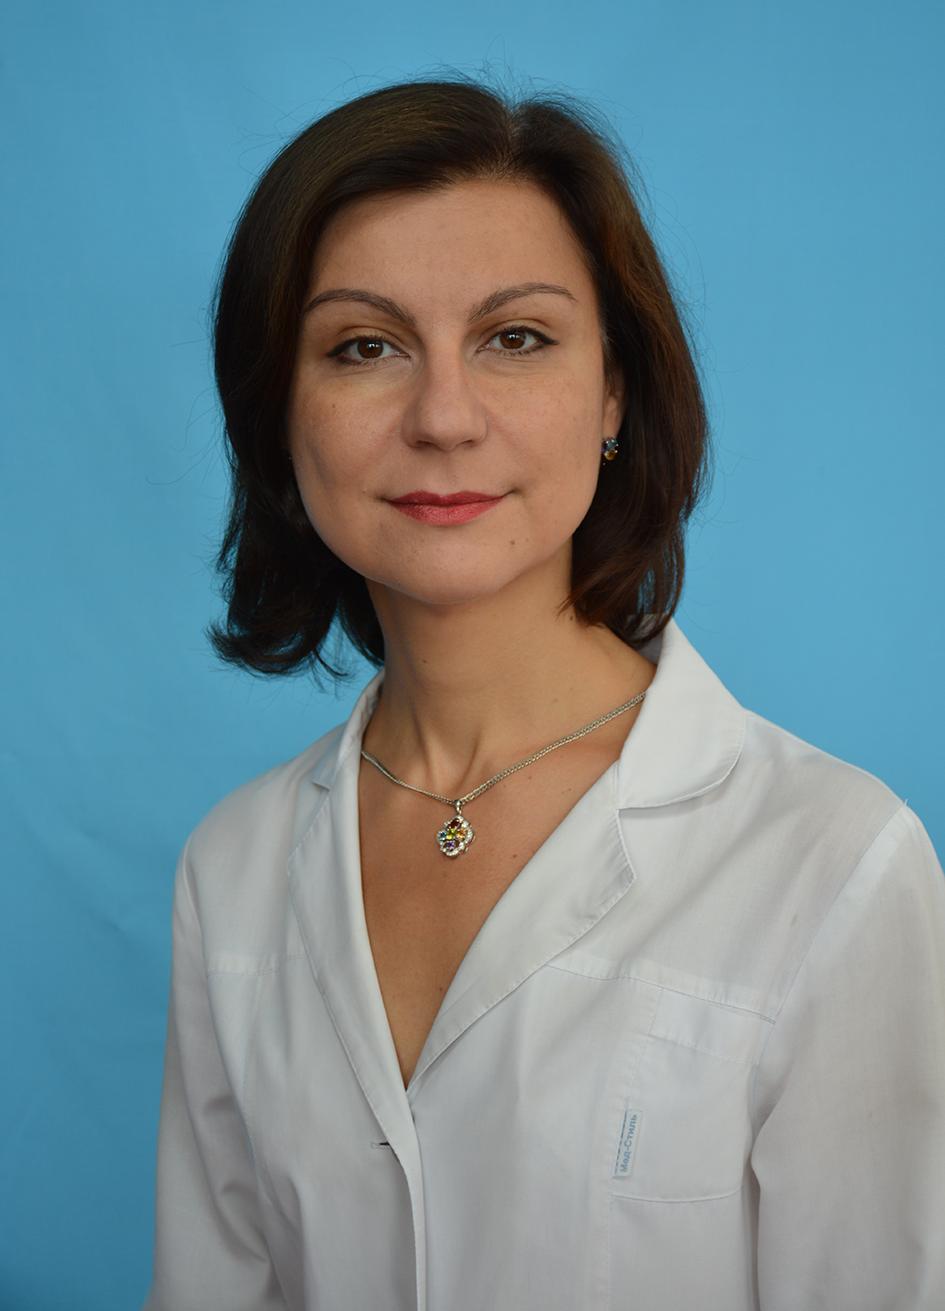 гинеколог акушер-гинеколог ванеева